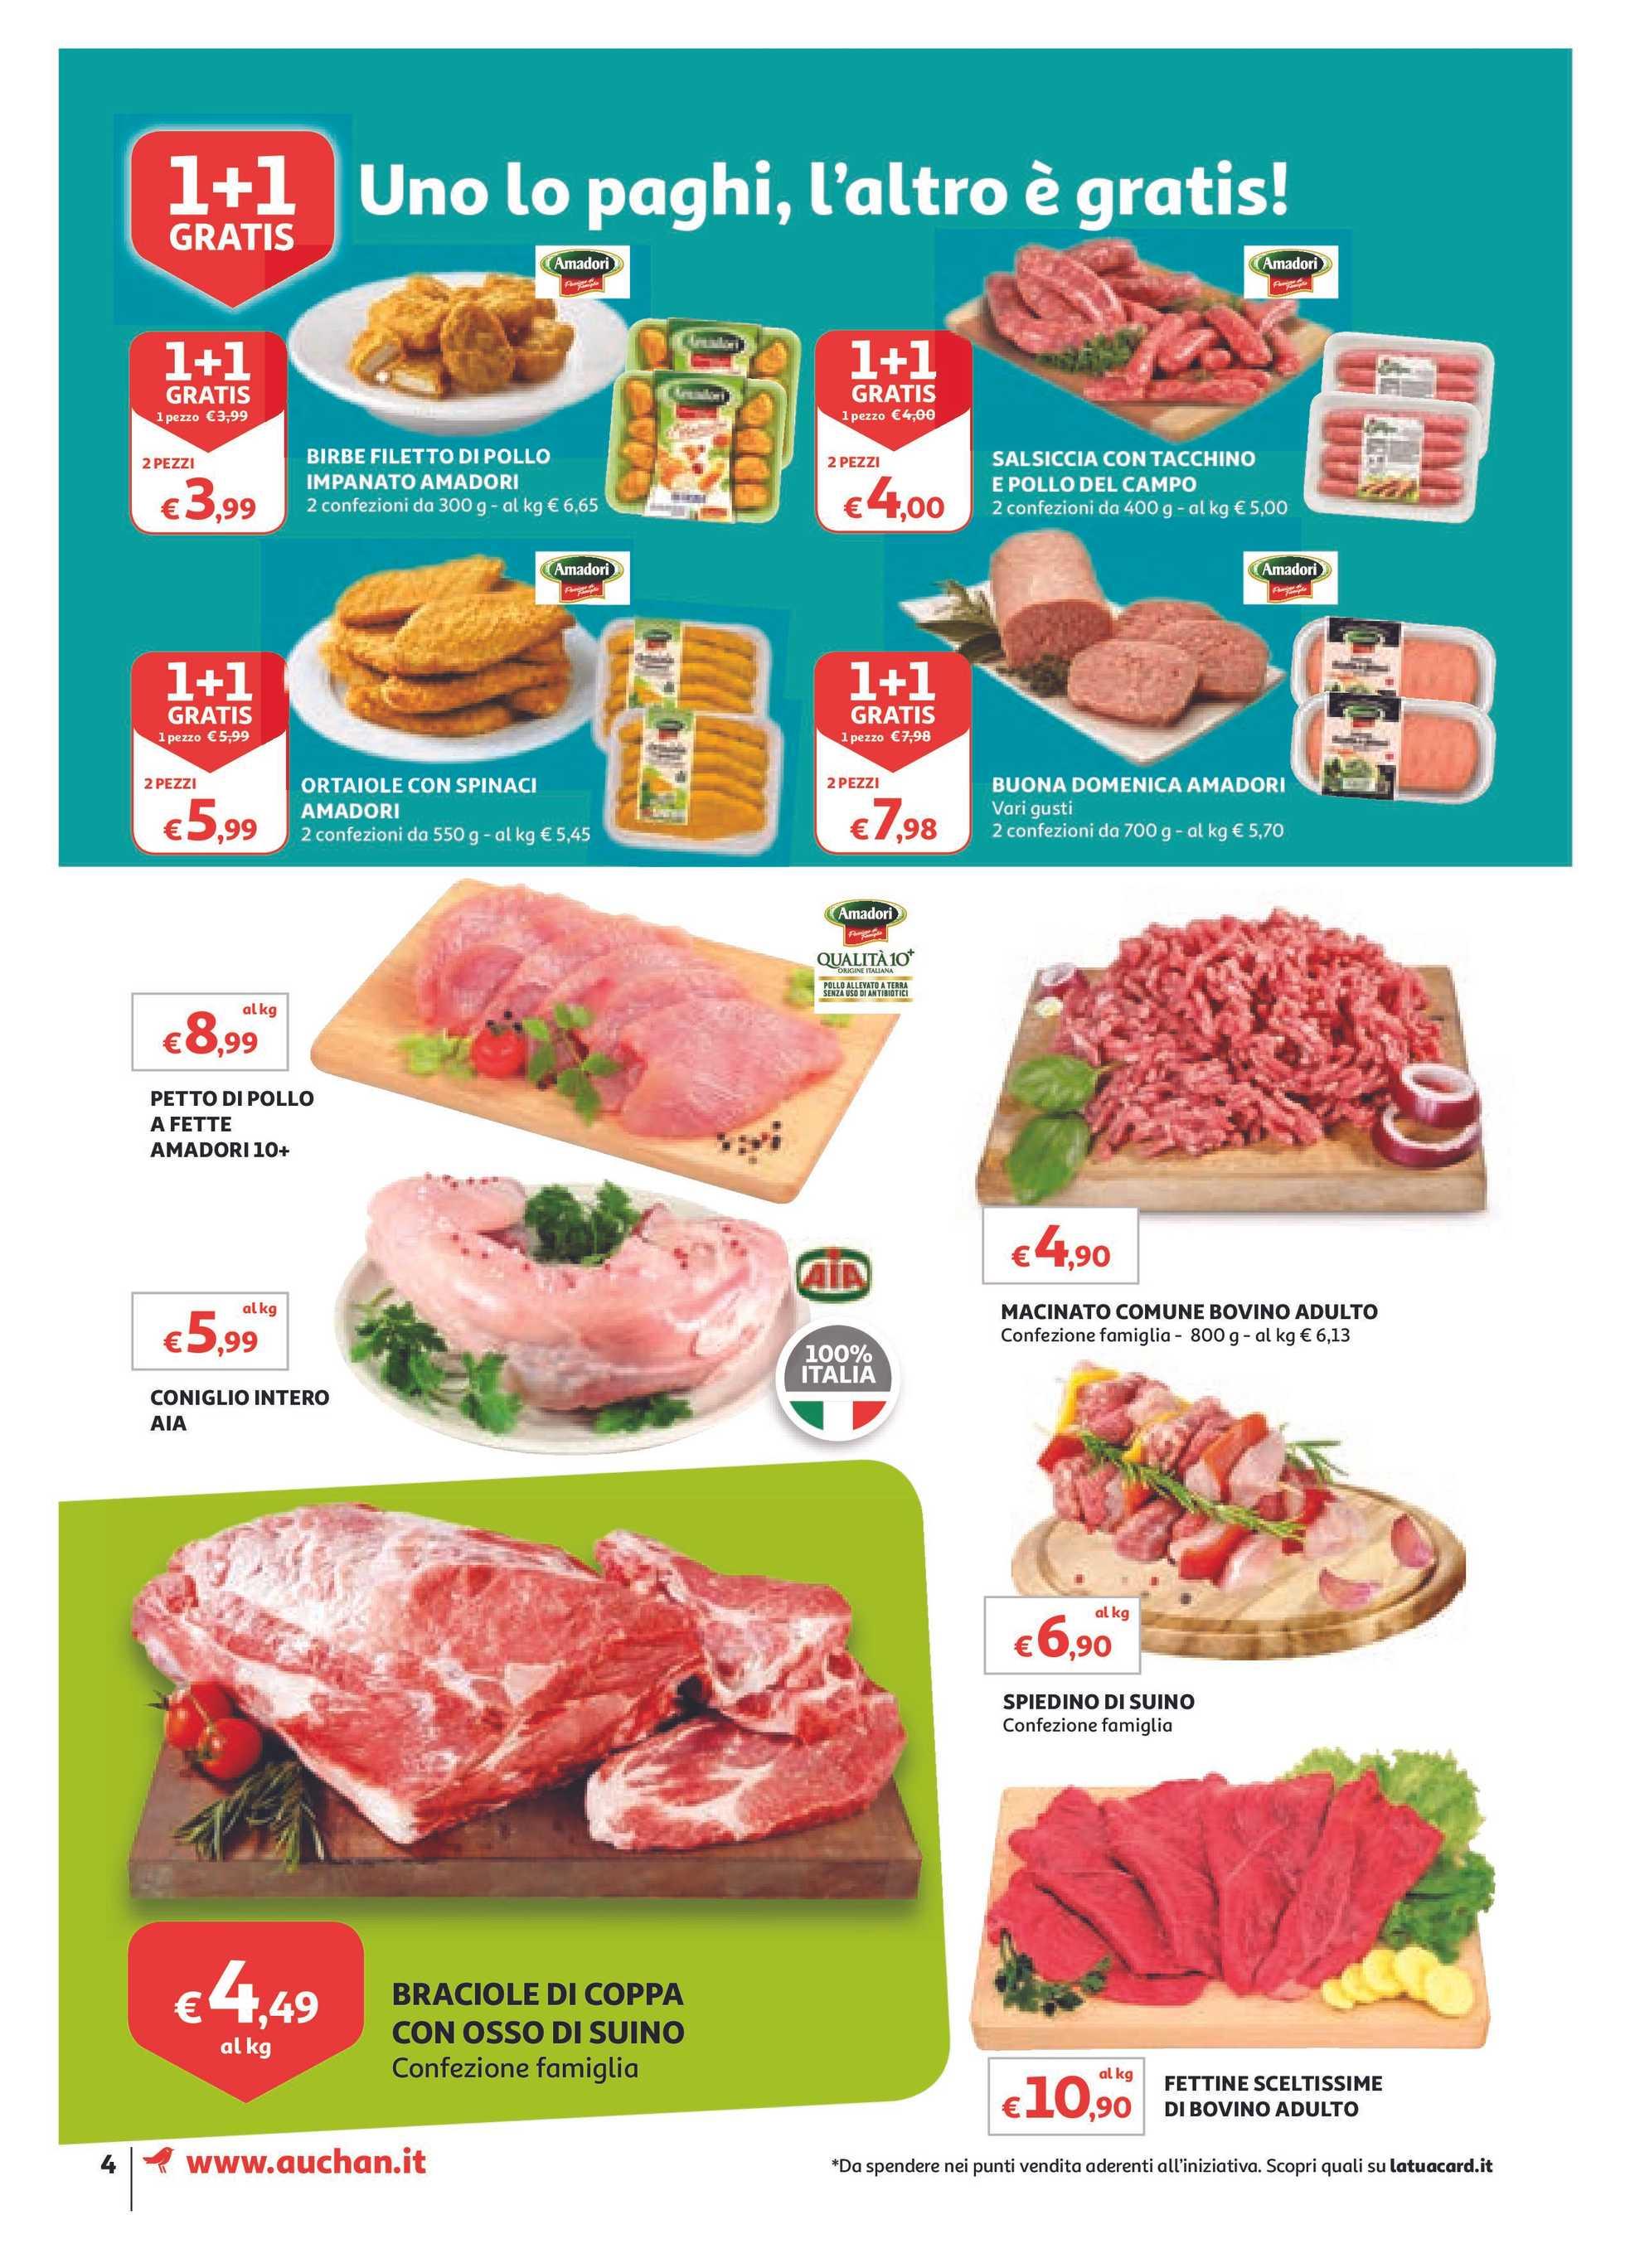 Auchan - offerte valide dal 01.03.2019 al 10.03.2019 - pagina 4.